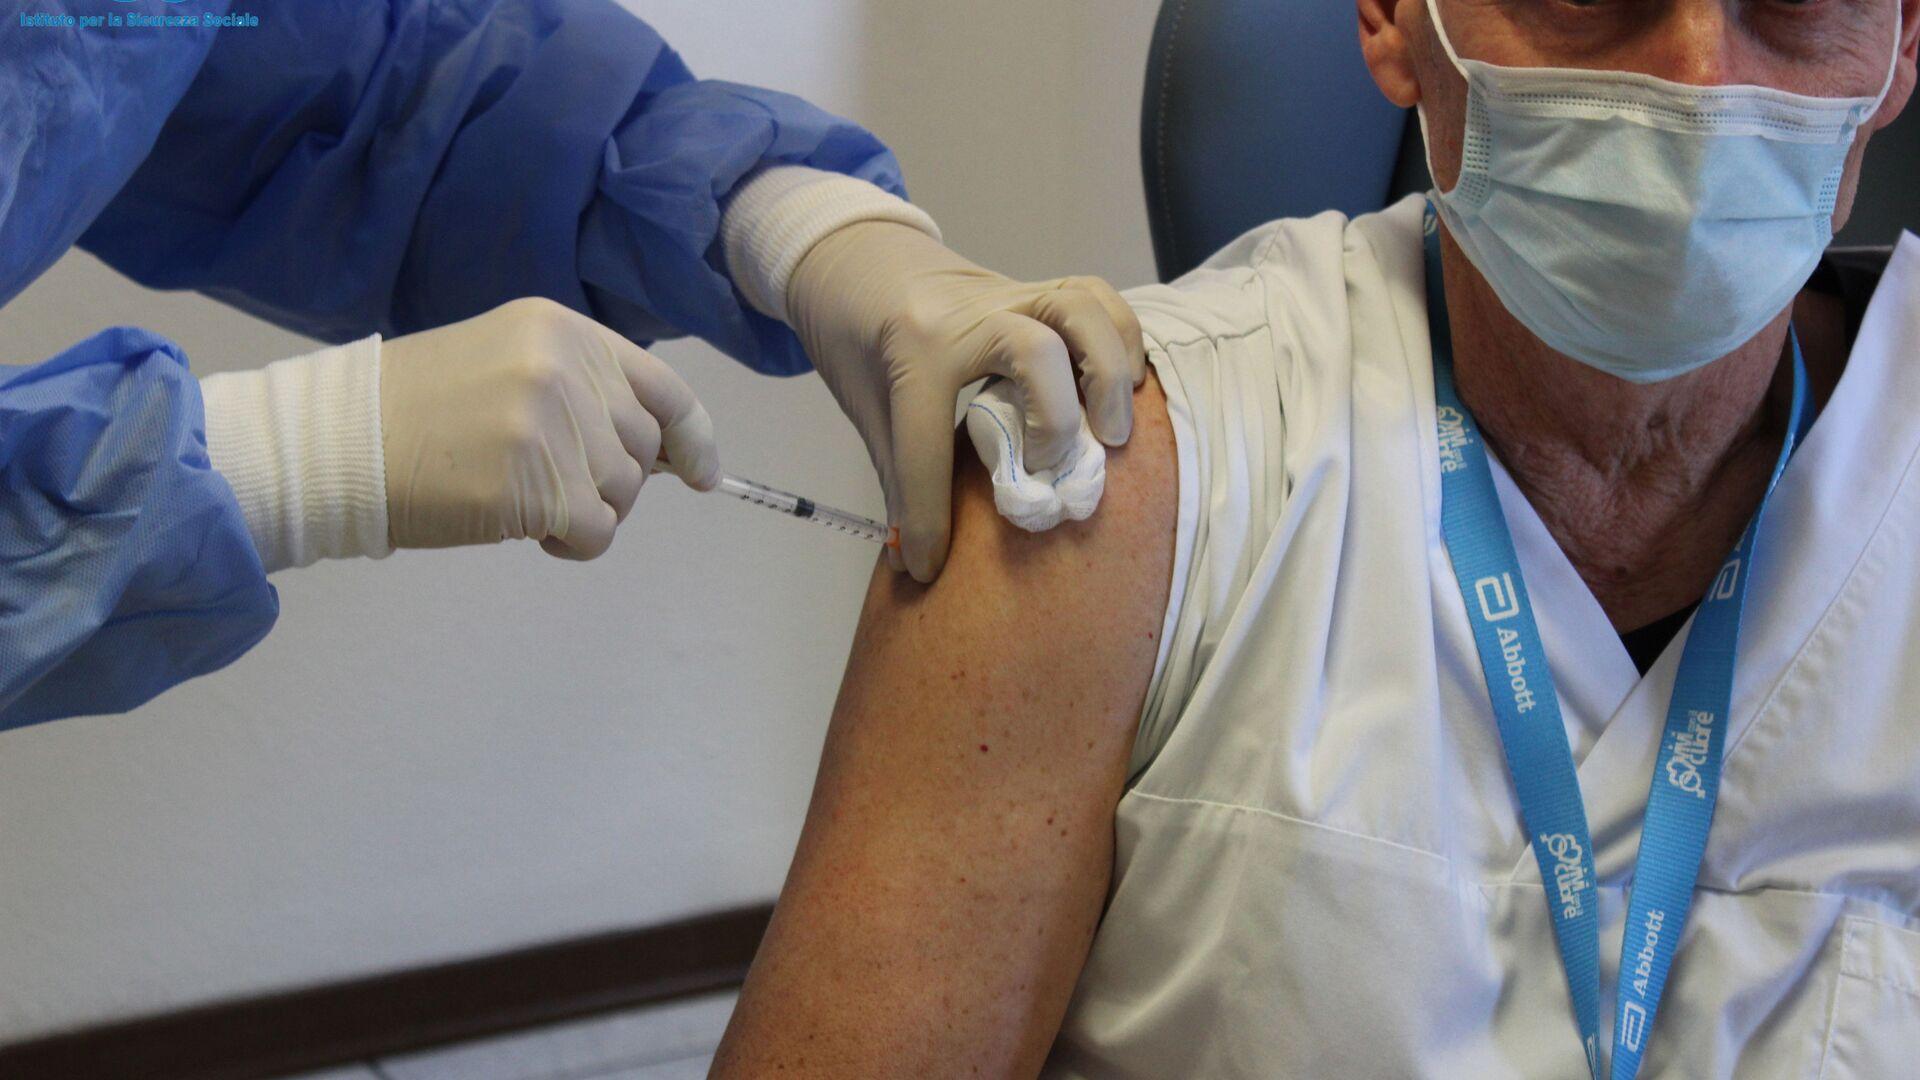 Vaccinazione con Sputnik V a San Marino - Sputnik Italia, 1920, 04.08.2021